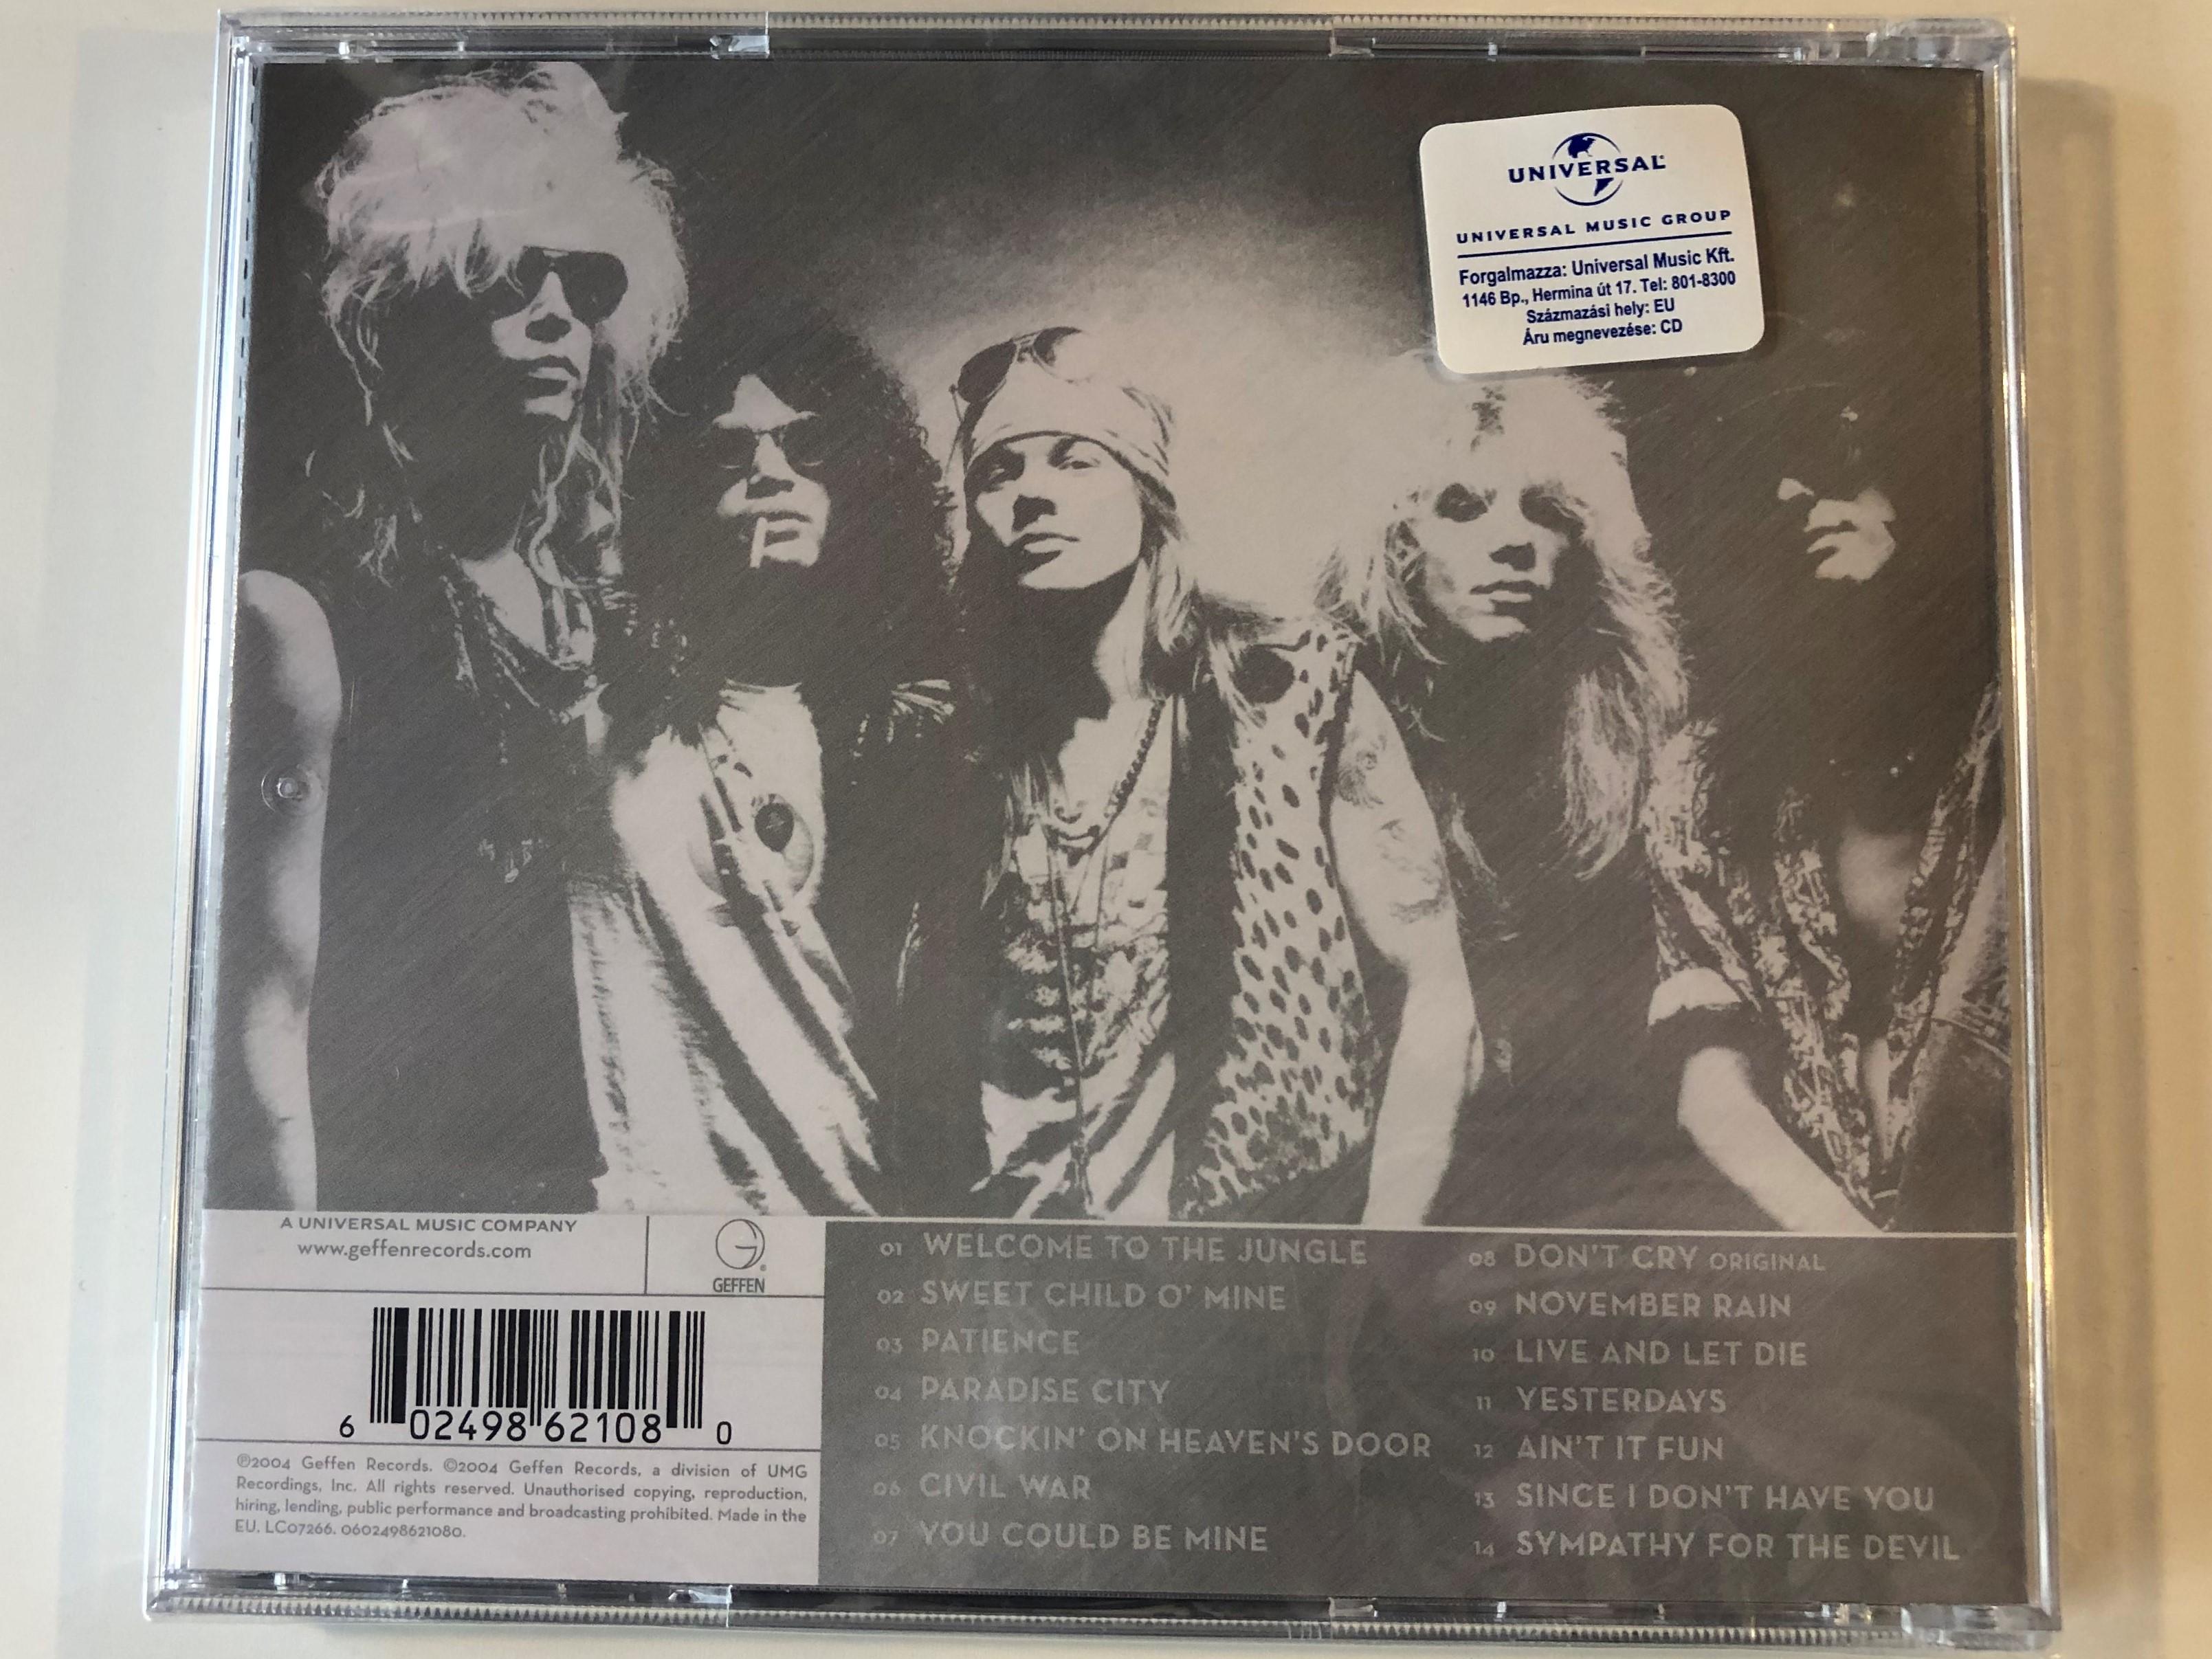 guns-n-roses-greatest-hits-geffen-records-audio-cd-2004-0602498621080-2-.jpg